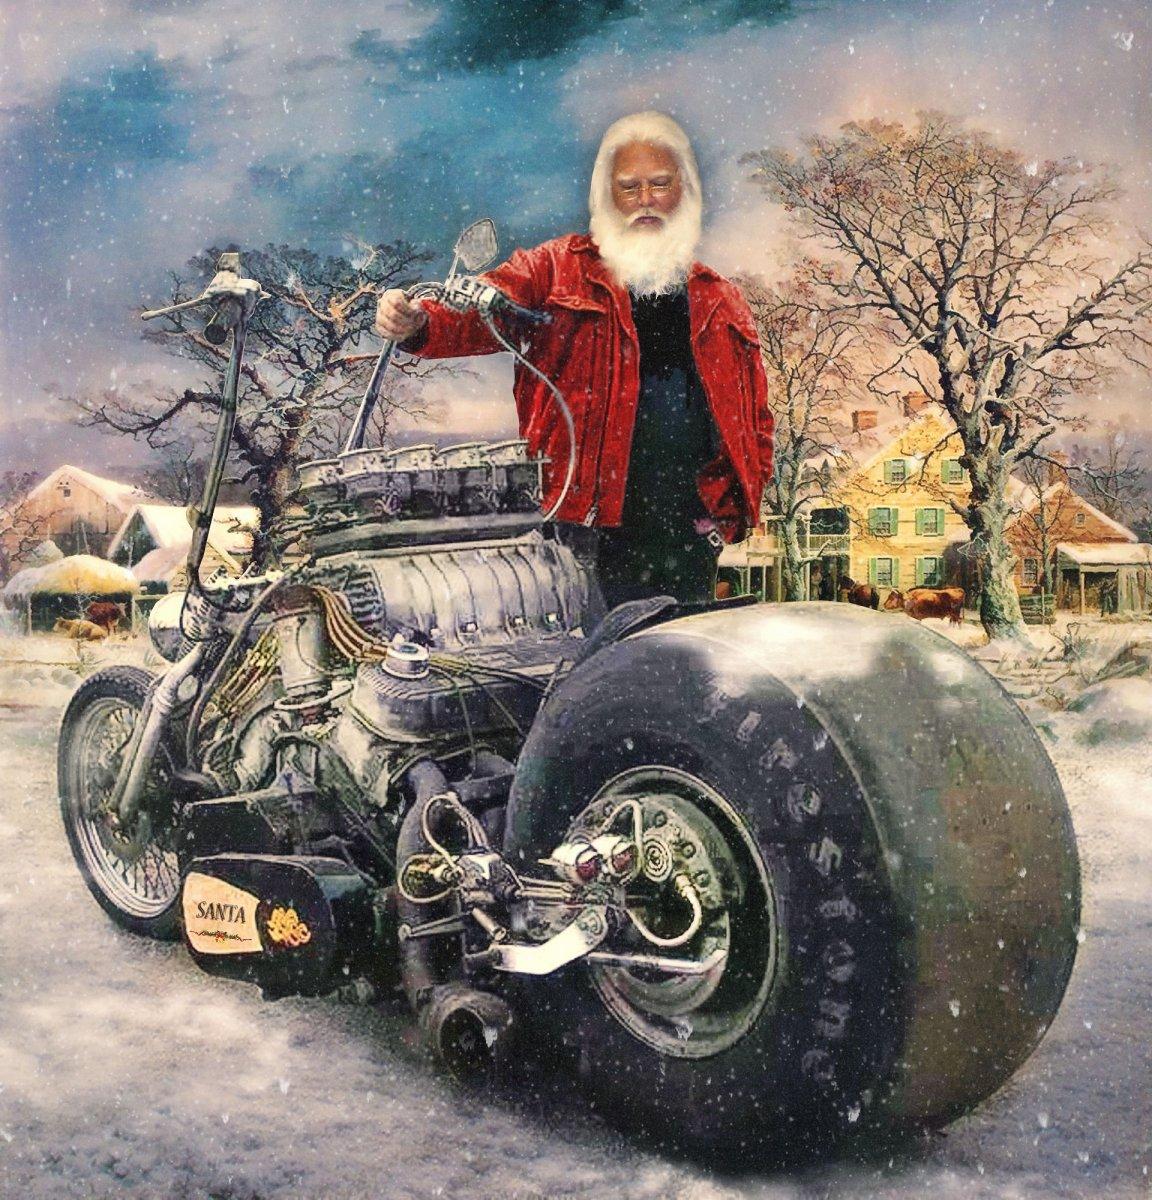 de4894c5bd79924dba0aadf87717cf3c_1920 biker santa 1 fin.jpg